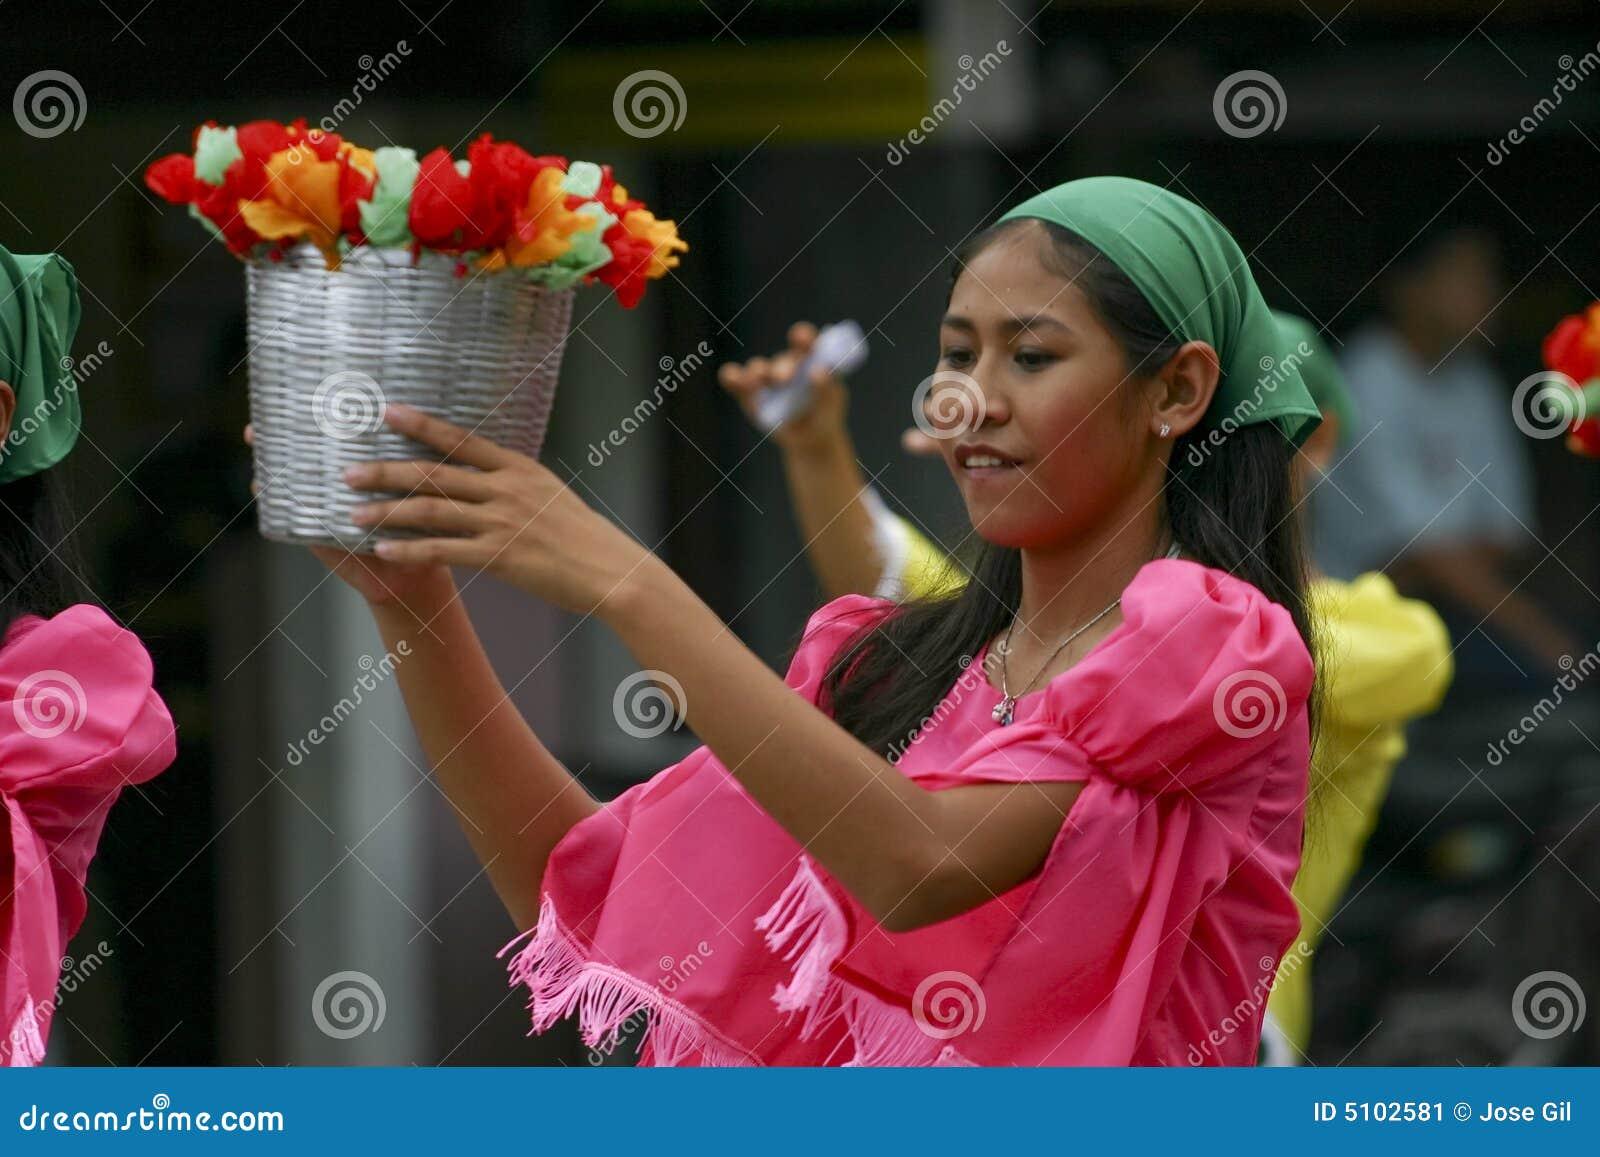 Pinay picture Filipino Brides: